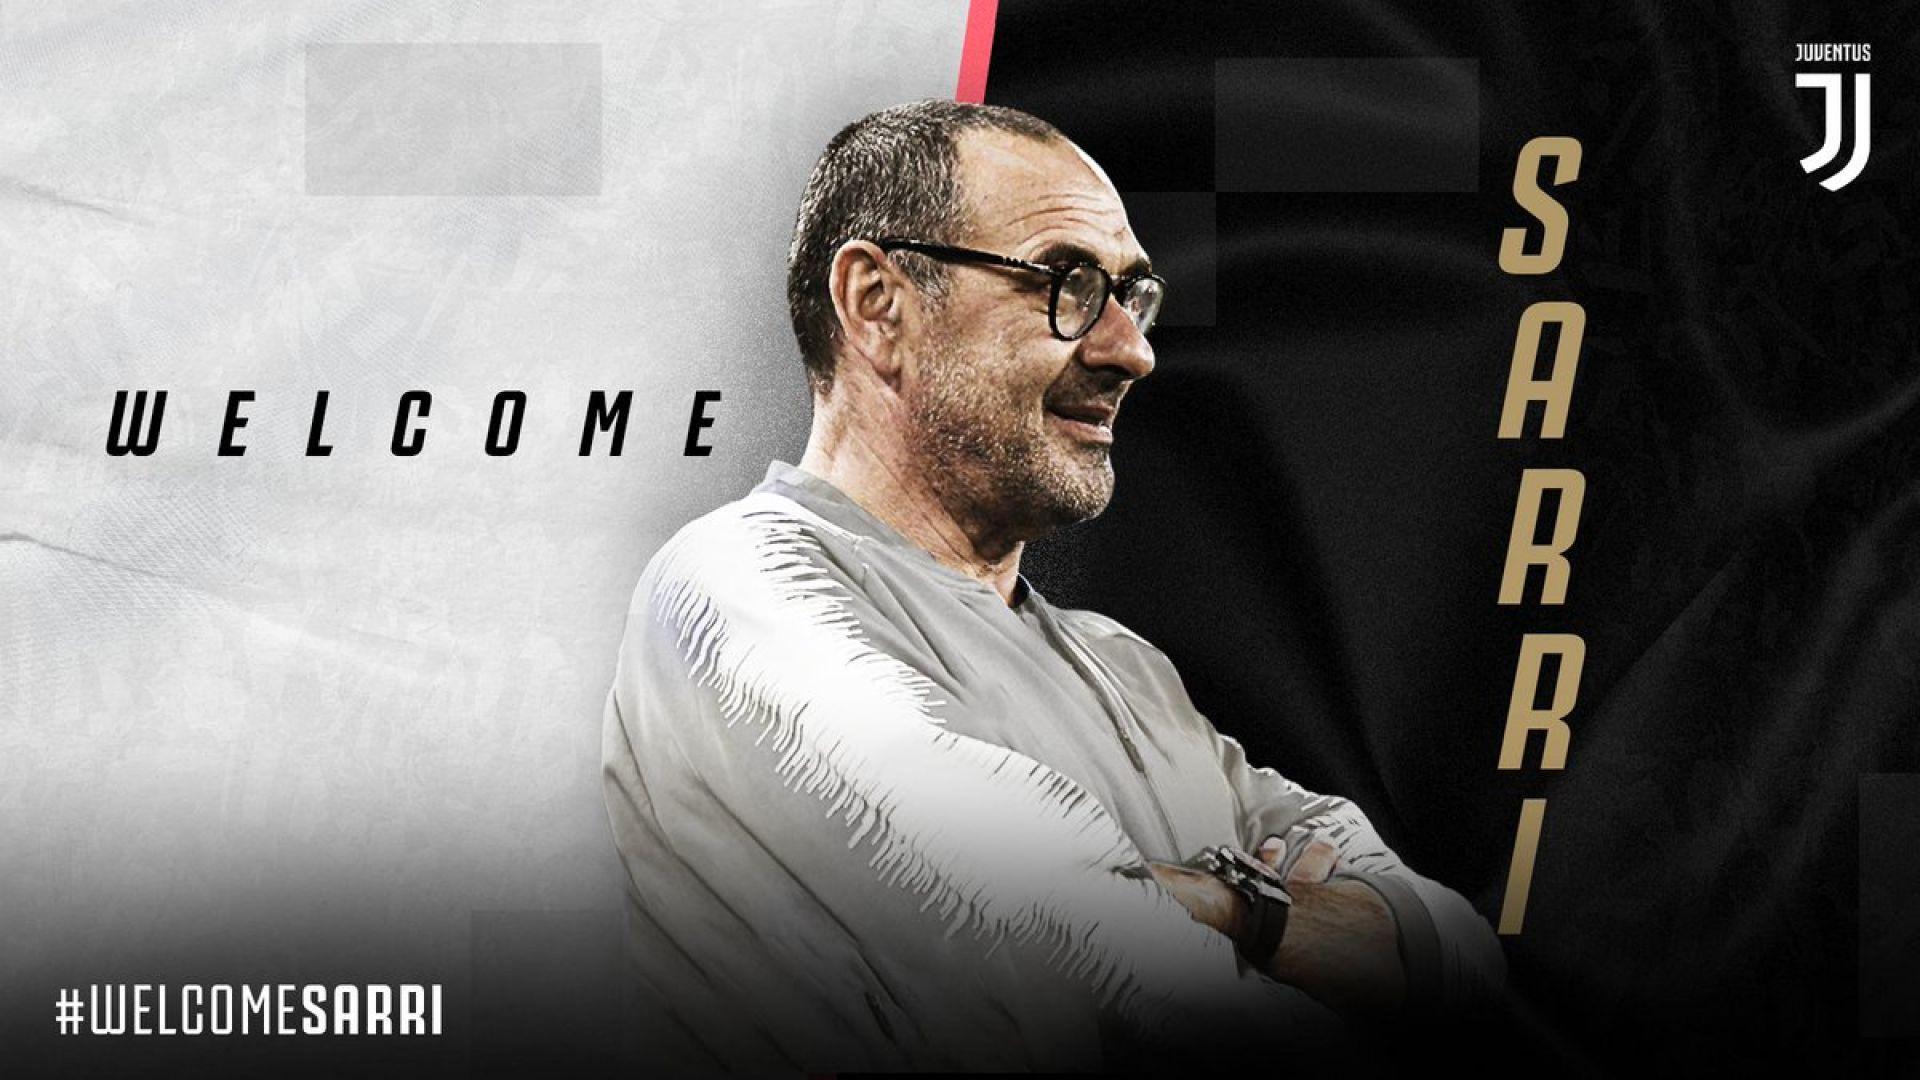 Ювентус официално обяви новия треньор